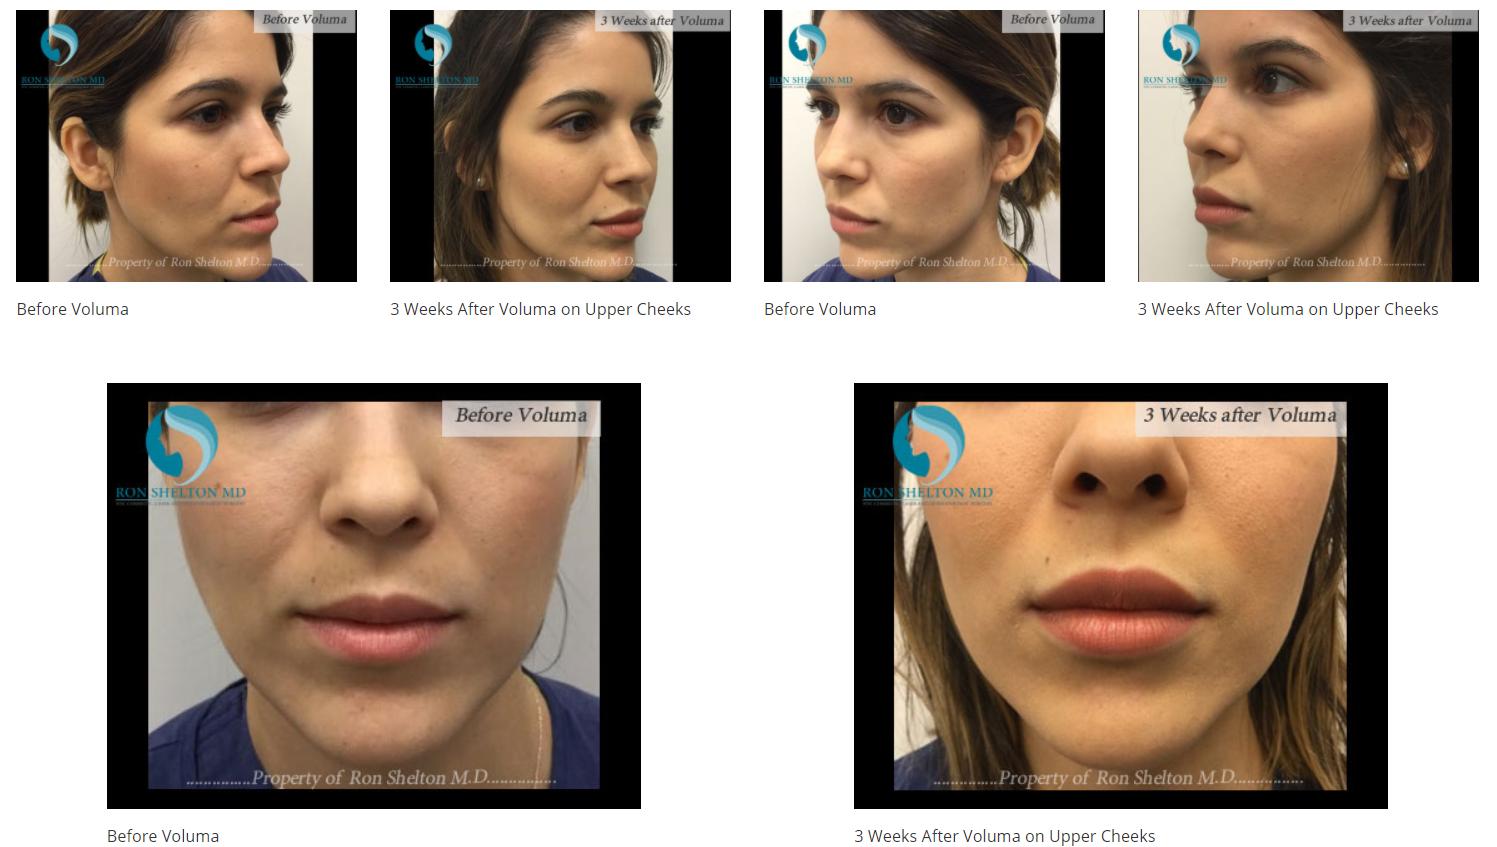 Voluma for face augmentation